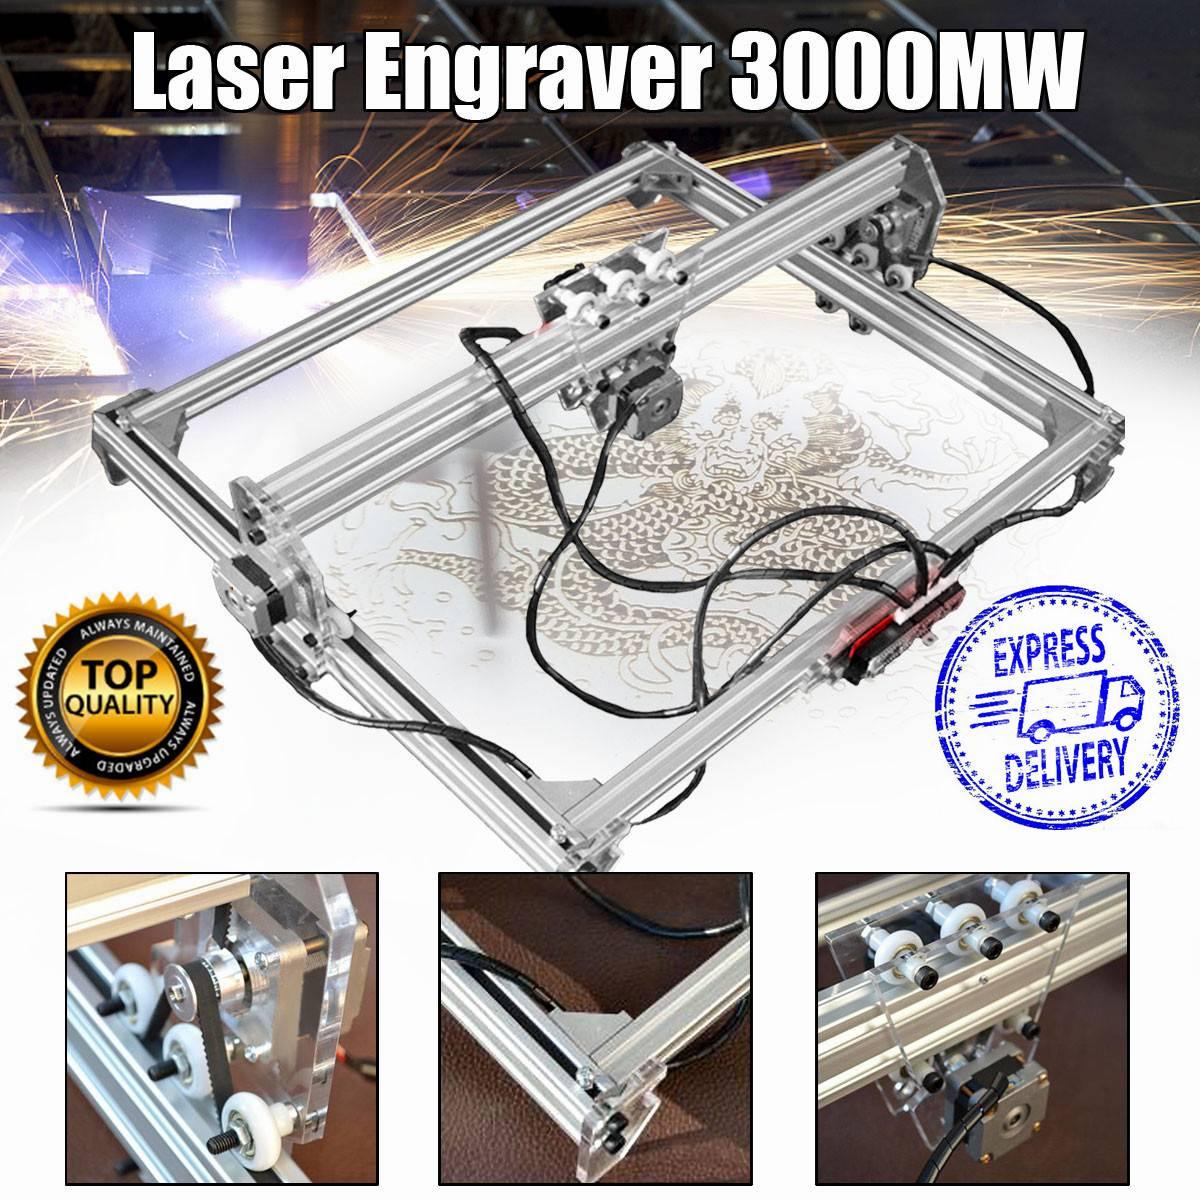 50*65 cm Mini 3000 MW azul grabado láser máquina de grabado DC 12 V DIY de escritorio de madera cortador/ impresora/potencia ajustable + gafas láser